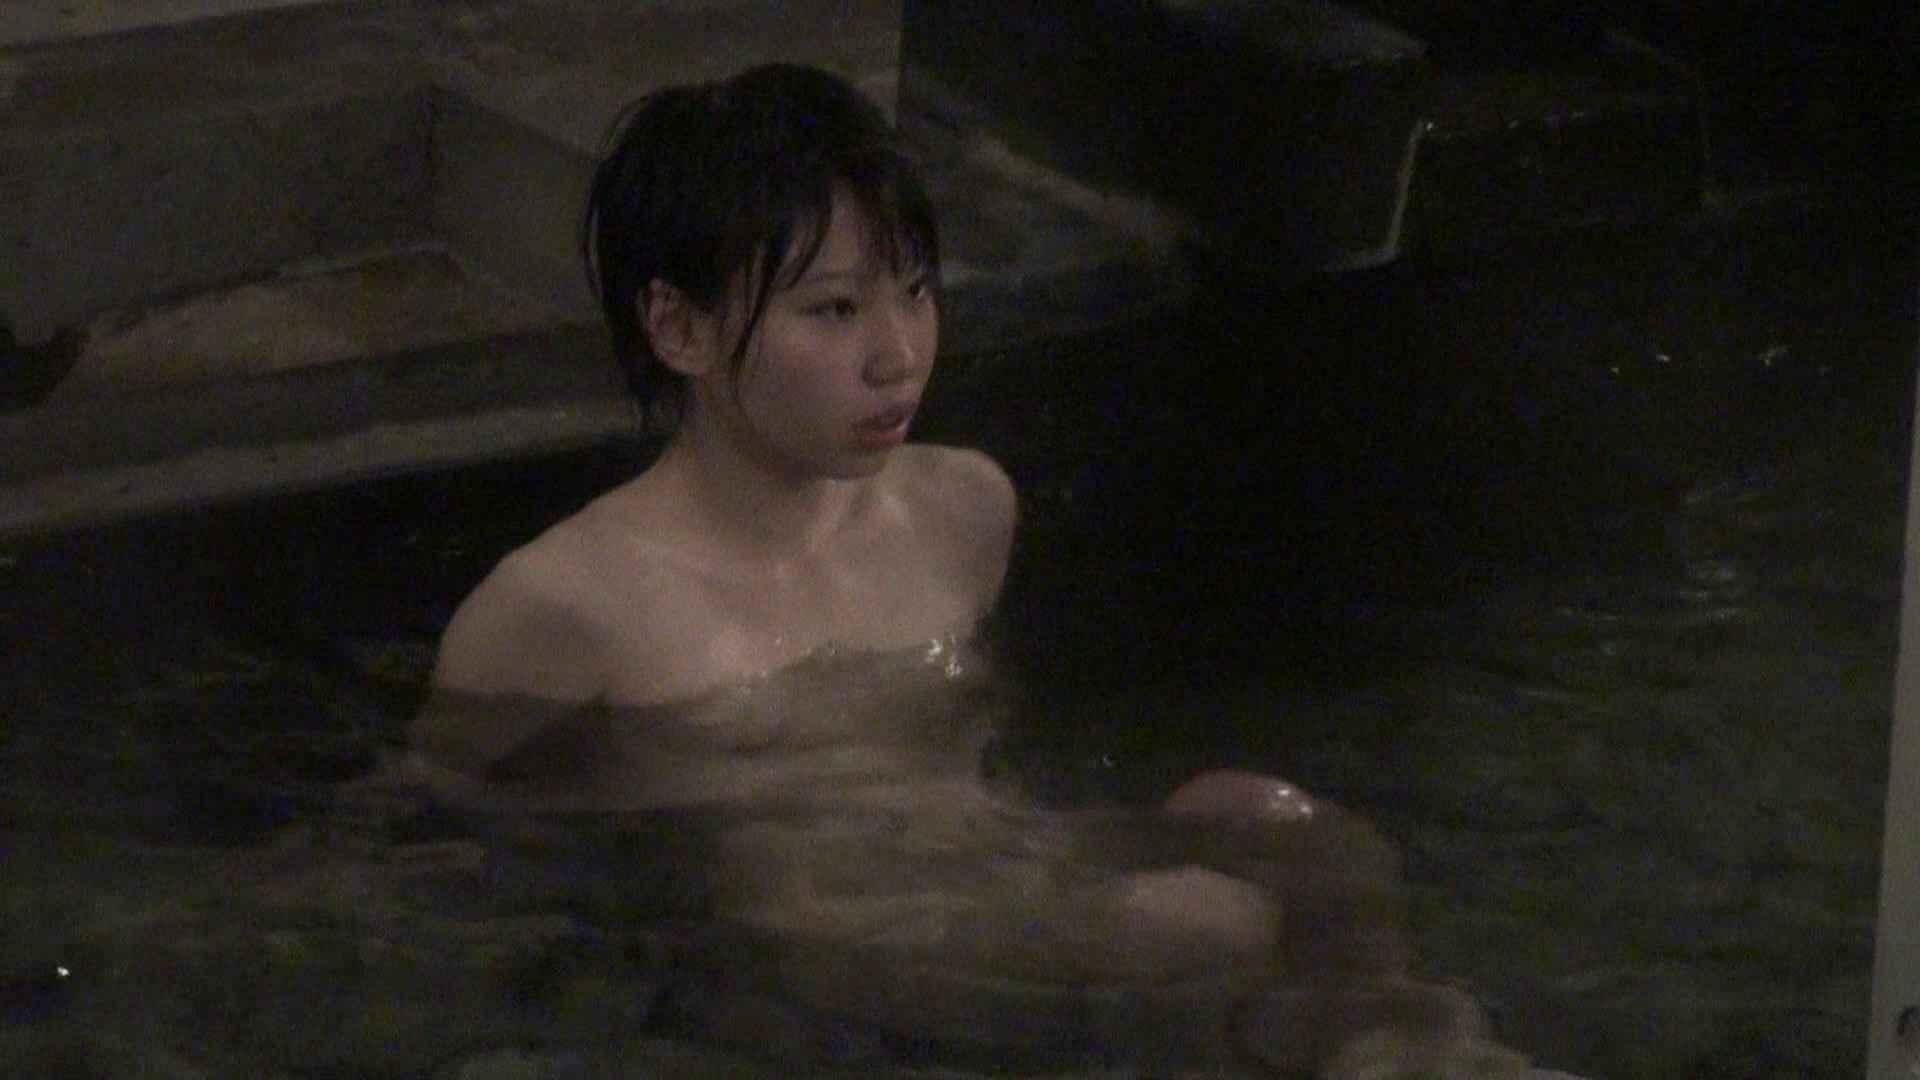 Aquaな露天風呂Vol.323 盗撮大放出 すけべAV動画紹介 69連発 18